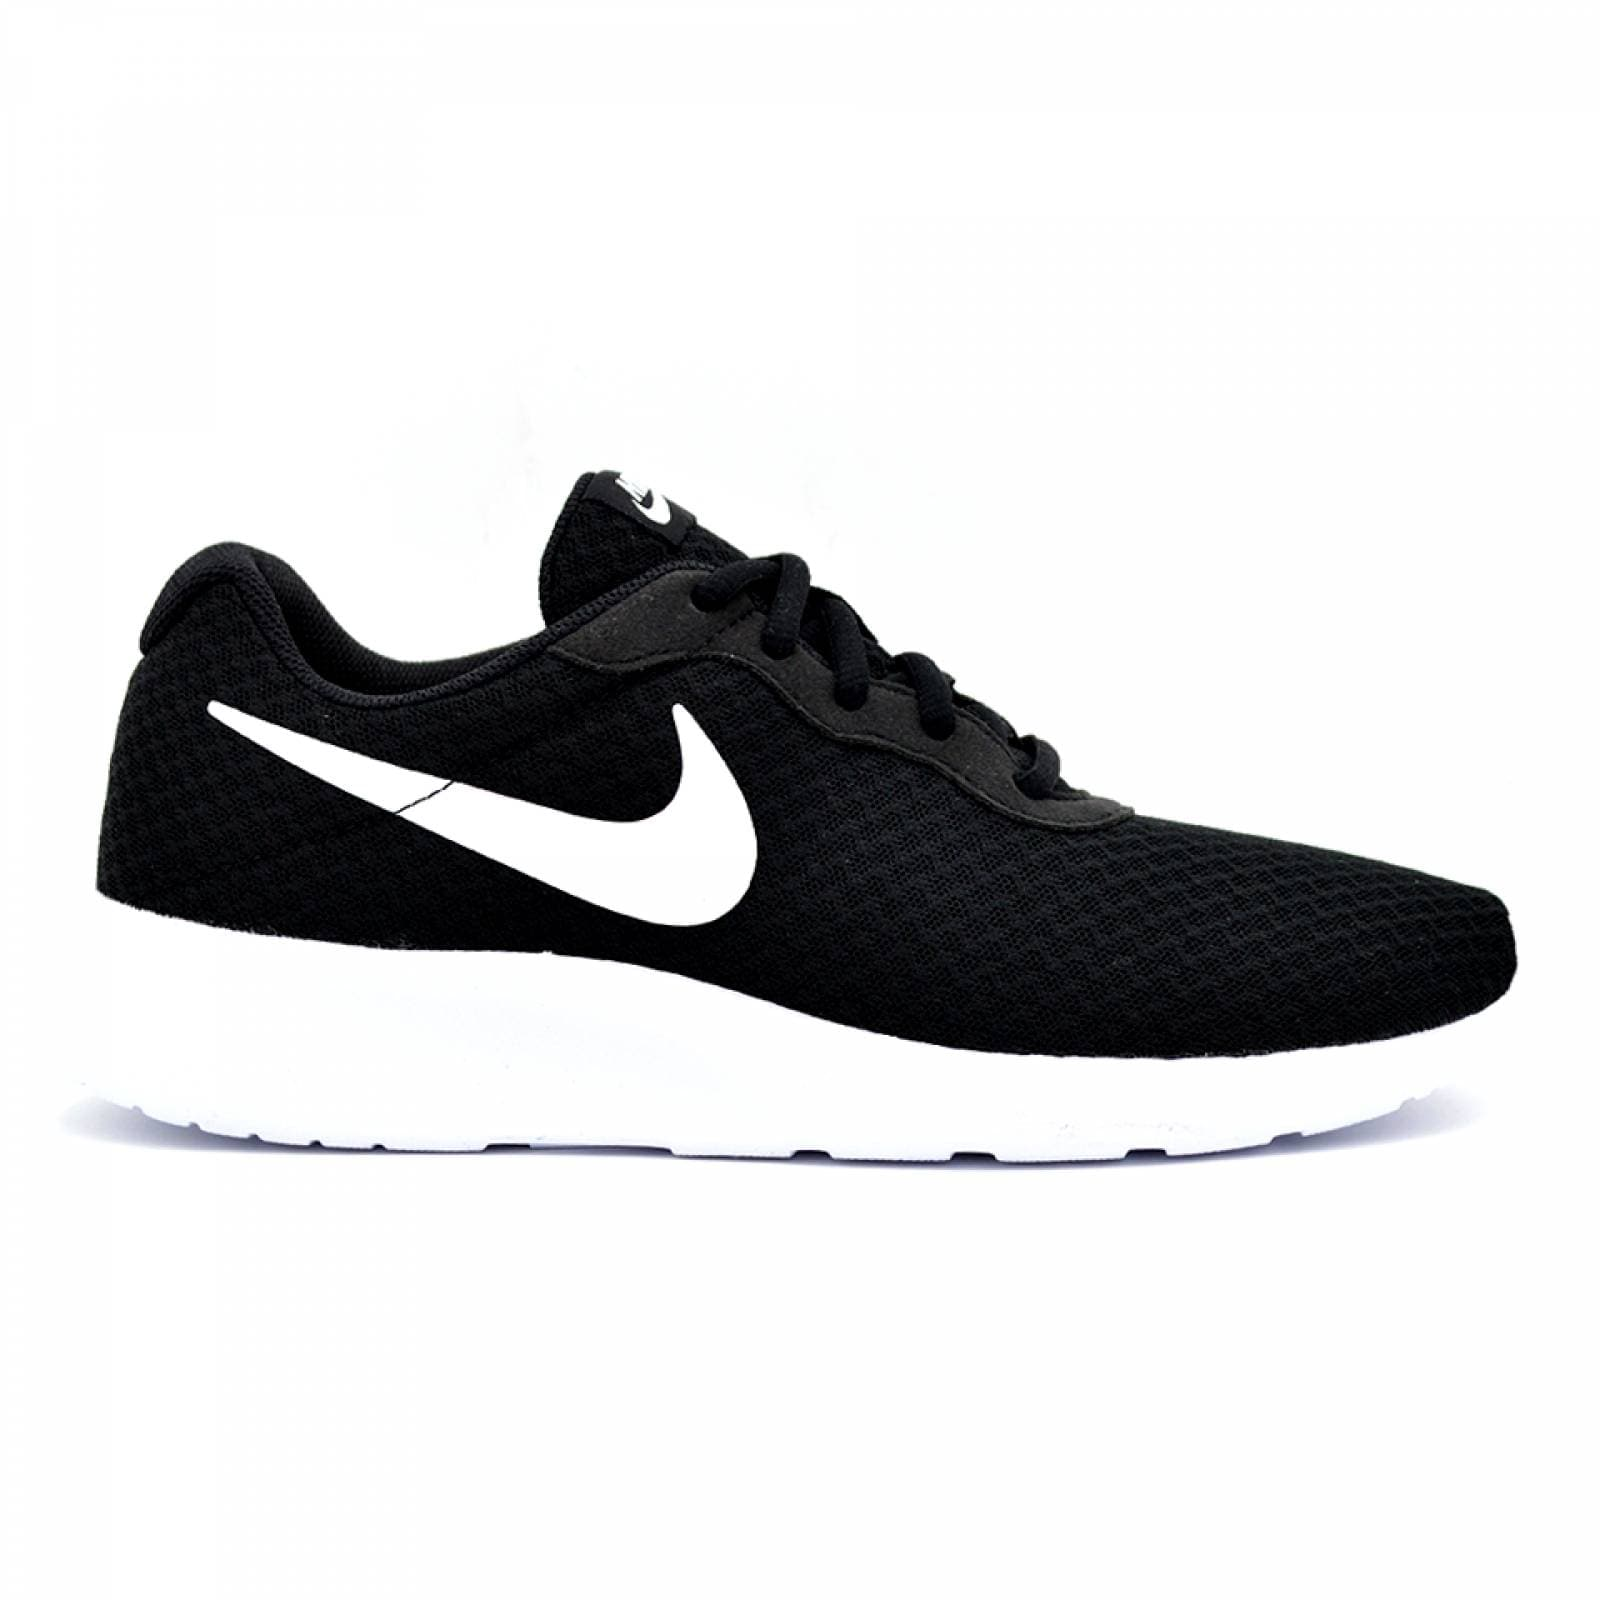 Tenis Nike para Hombre 812654 011 Negro NIK1862